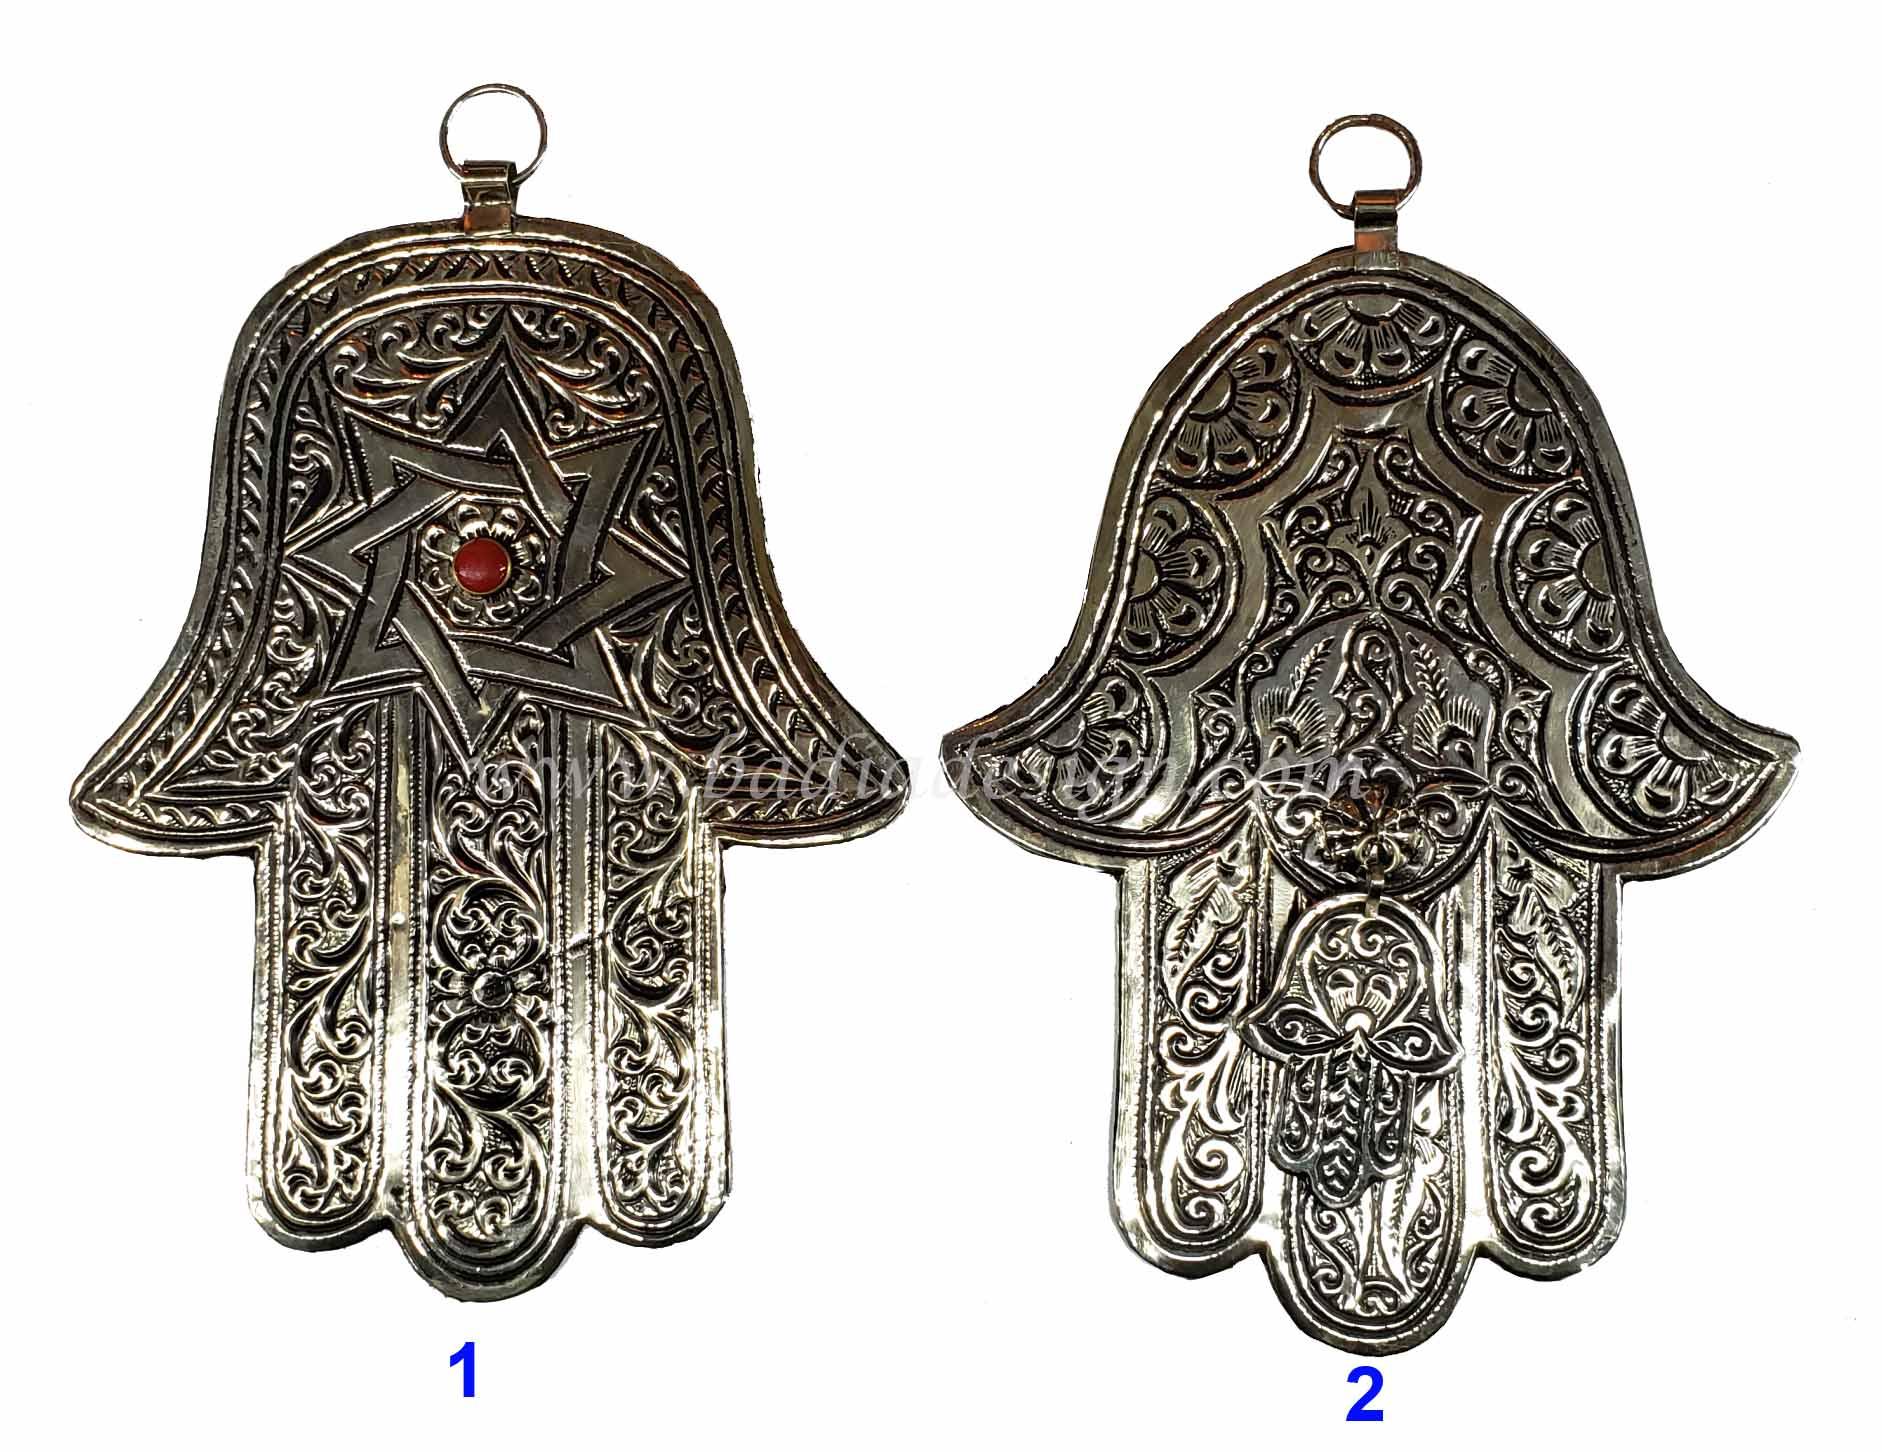 khamsa-hand-of-fatima-pendant-hd190.jpg